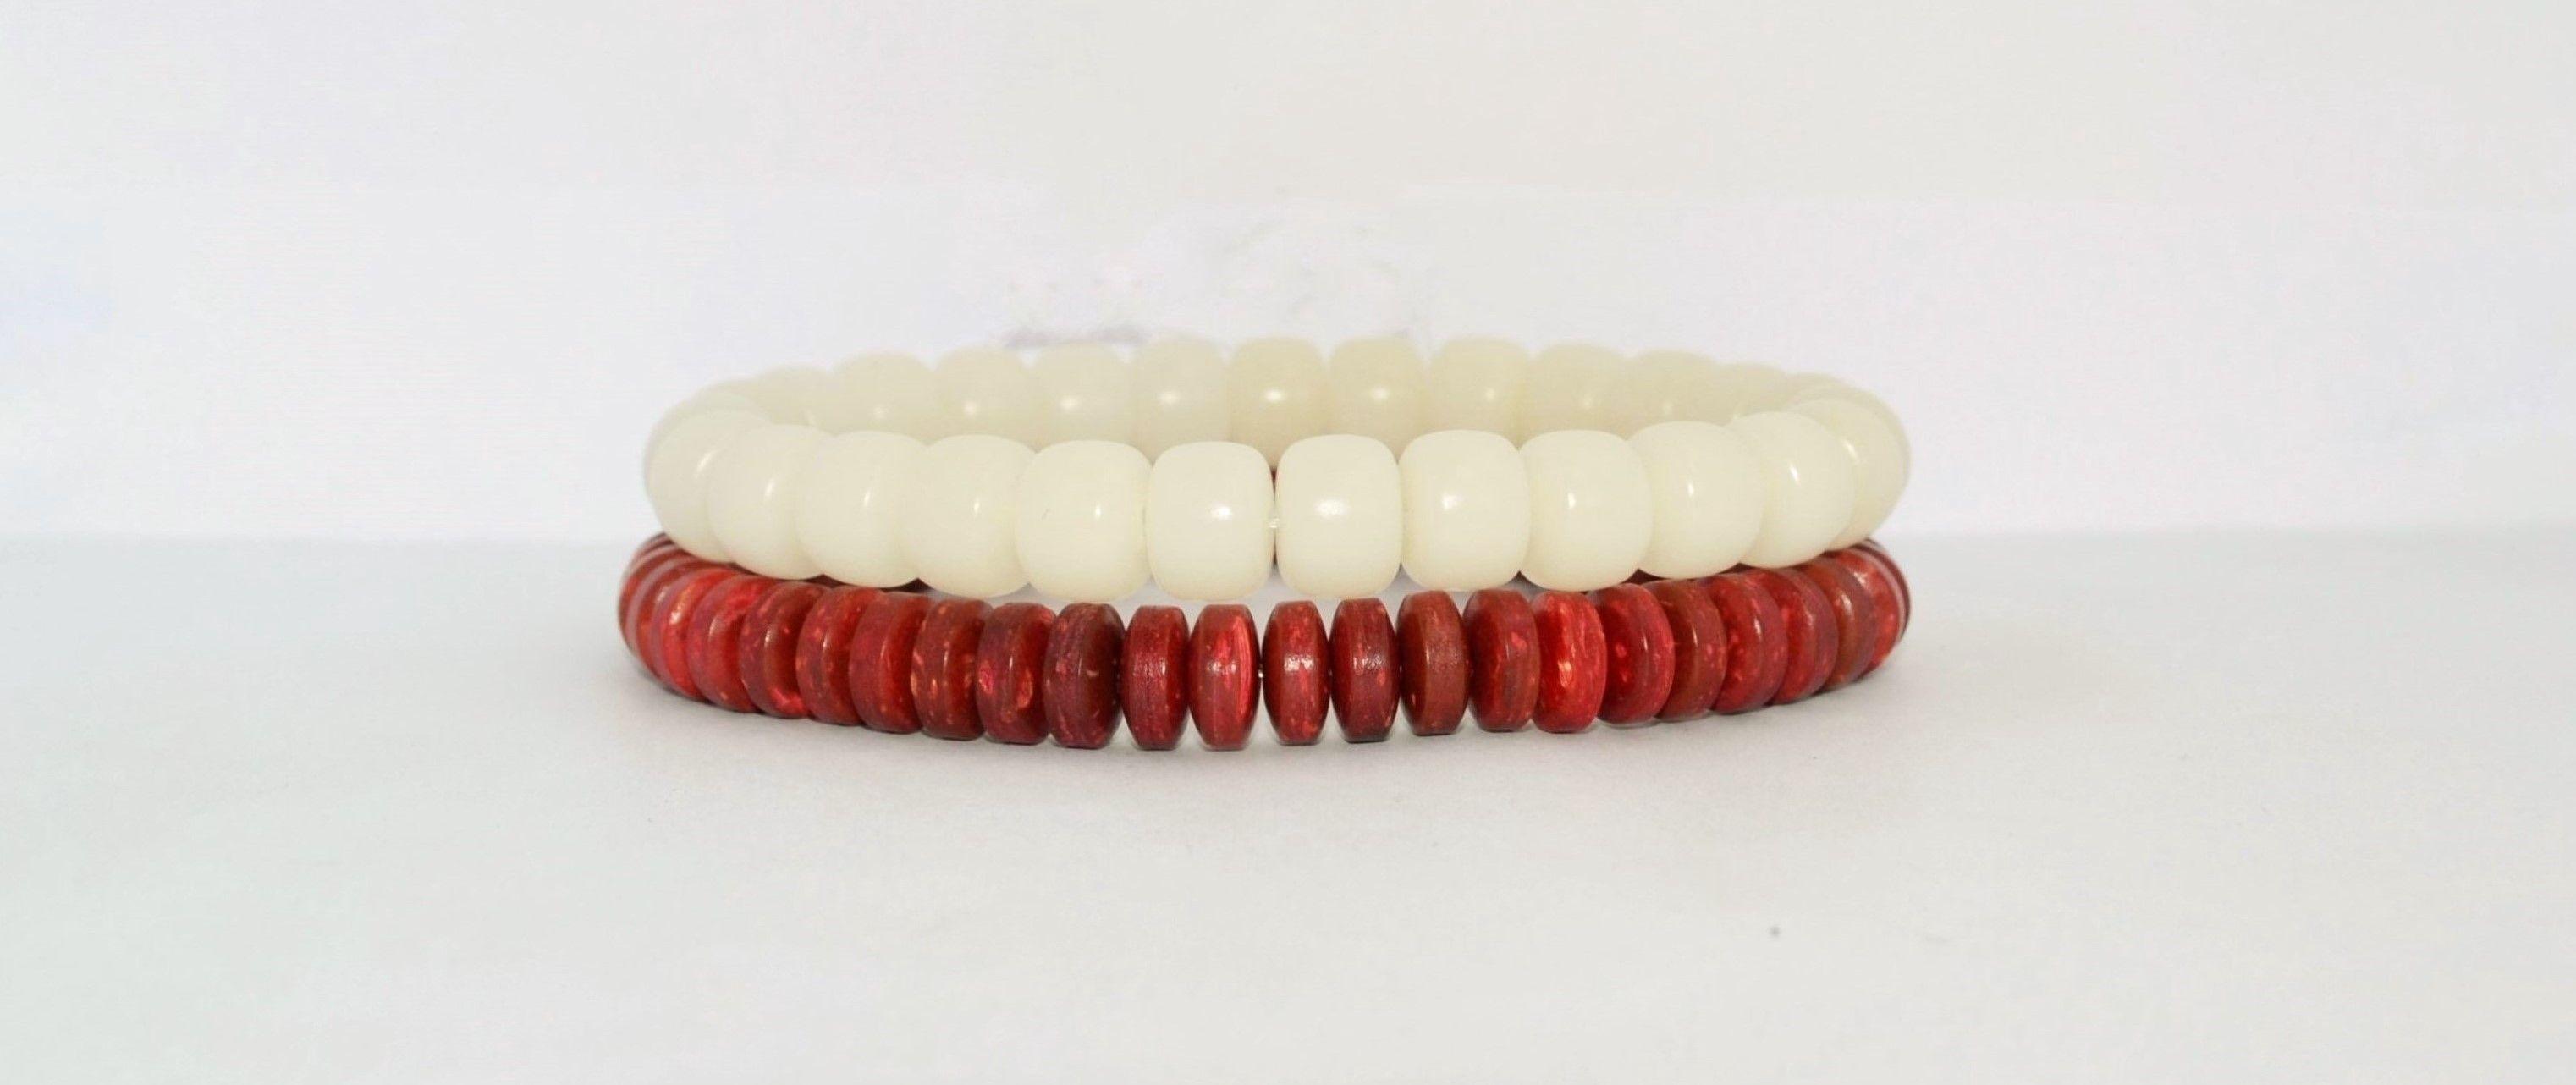 Mens Coconut Bracelet Mens Tagua Bracelet Nautical Mala Bracelets Red And  White Bracelets Surfer Bracelets Beach Jewelry Summer Yoga Chakra